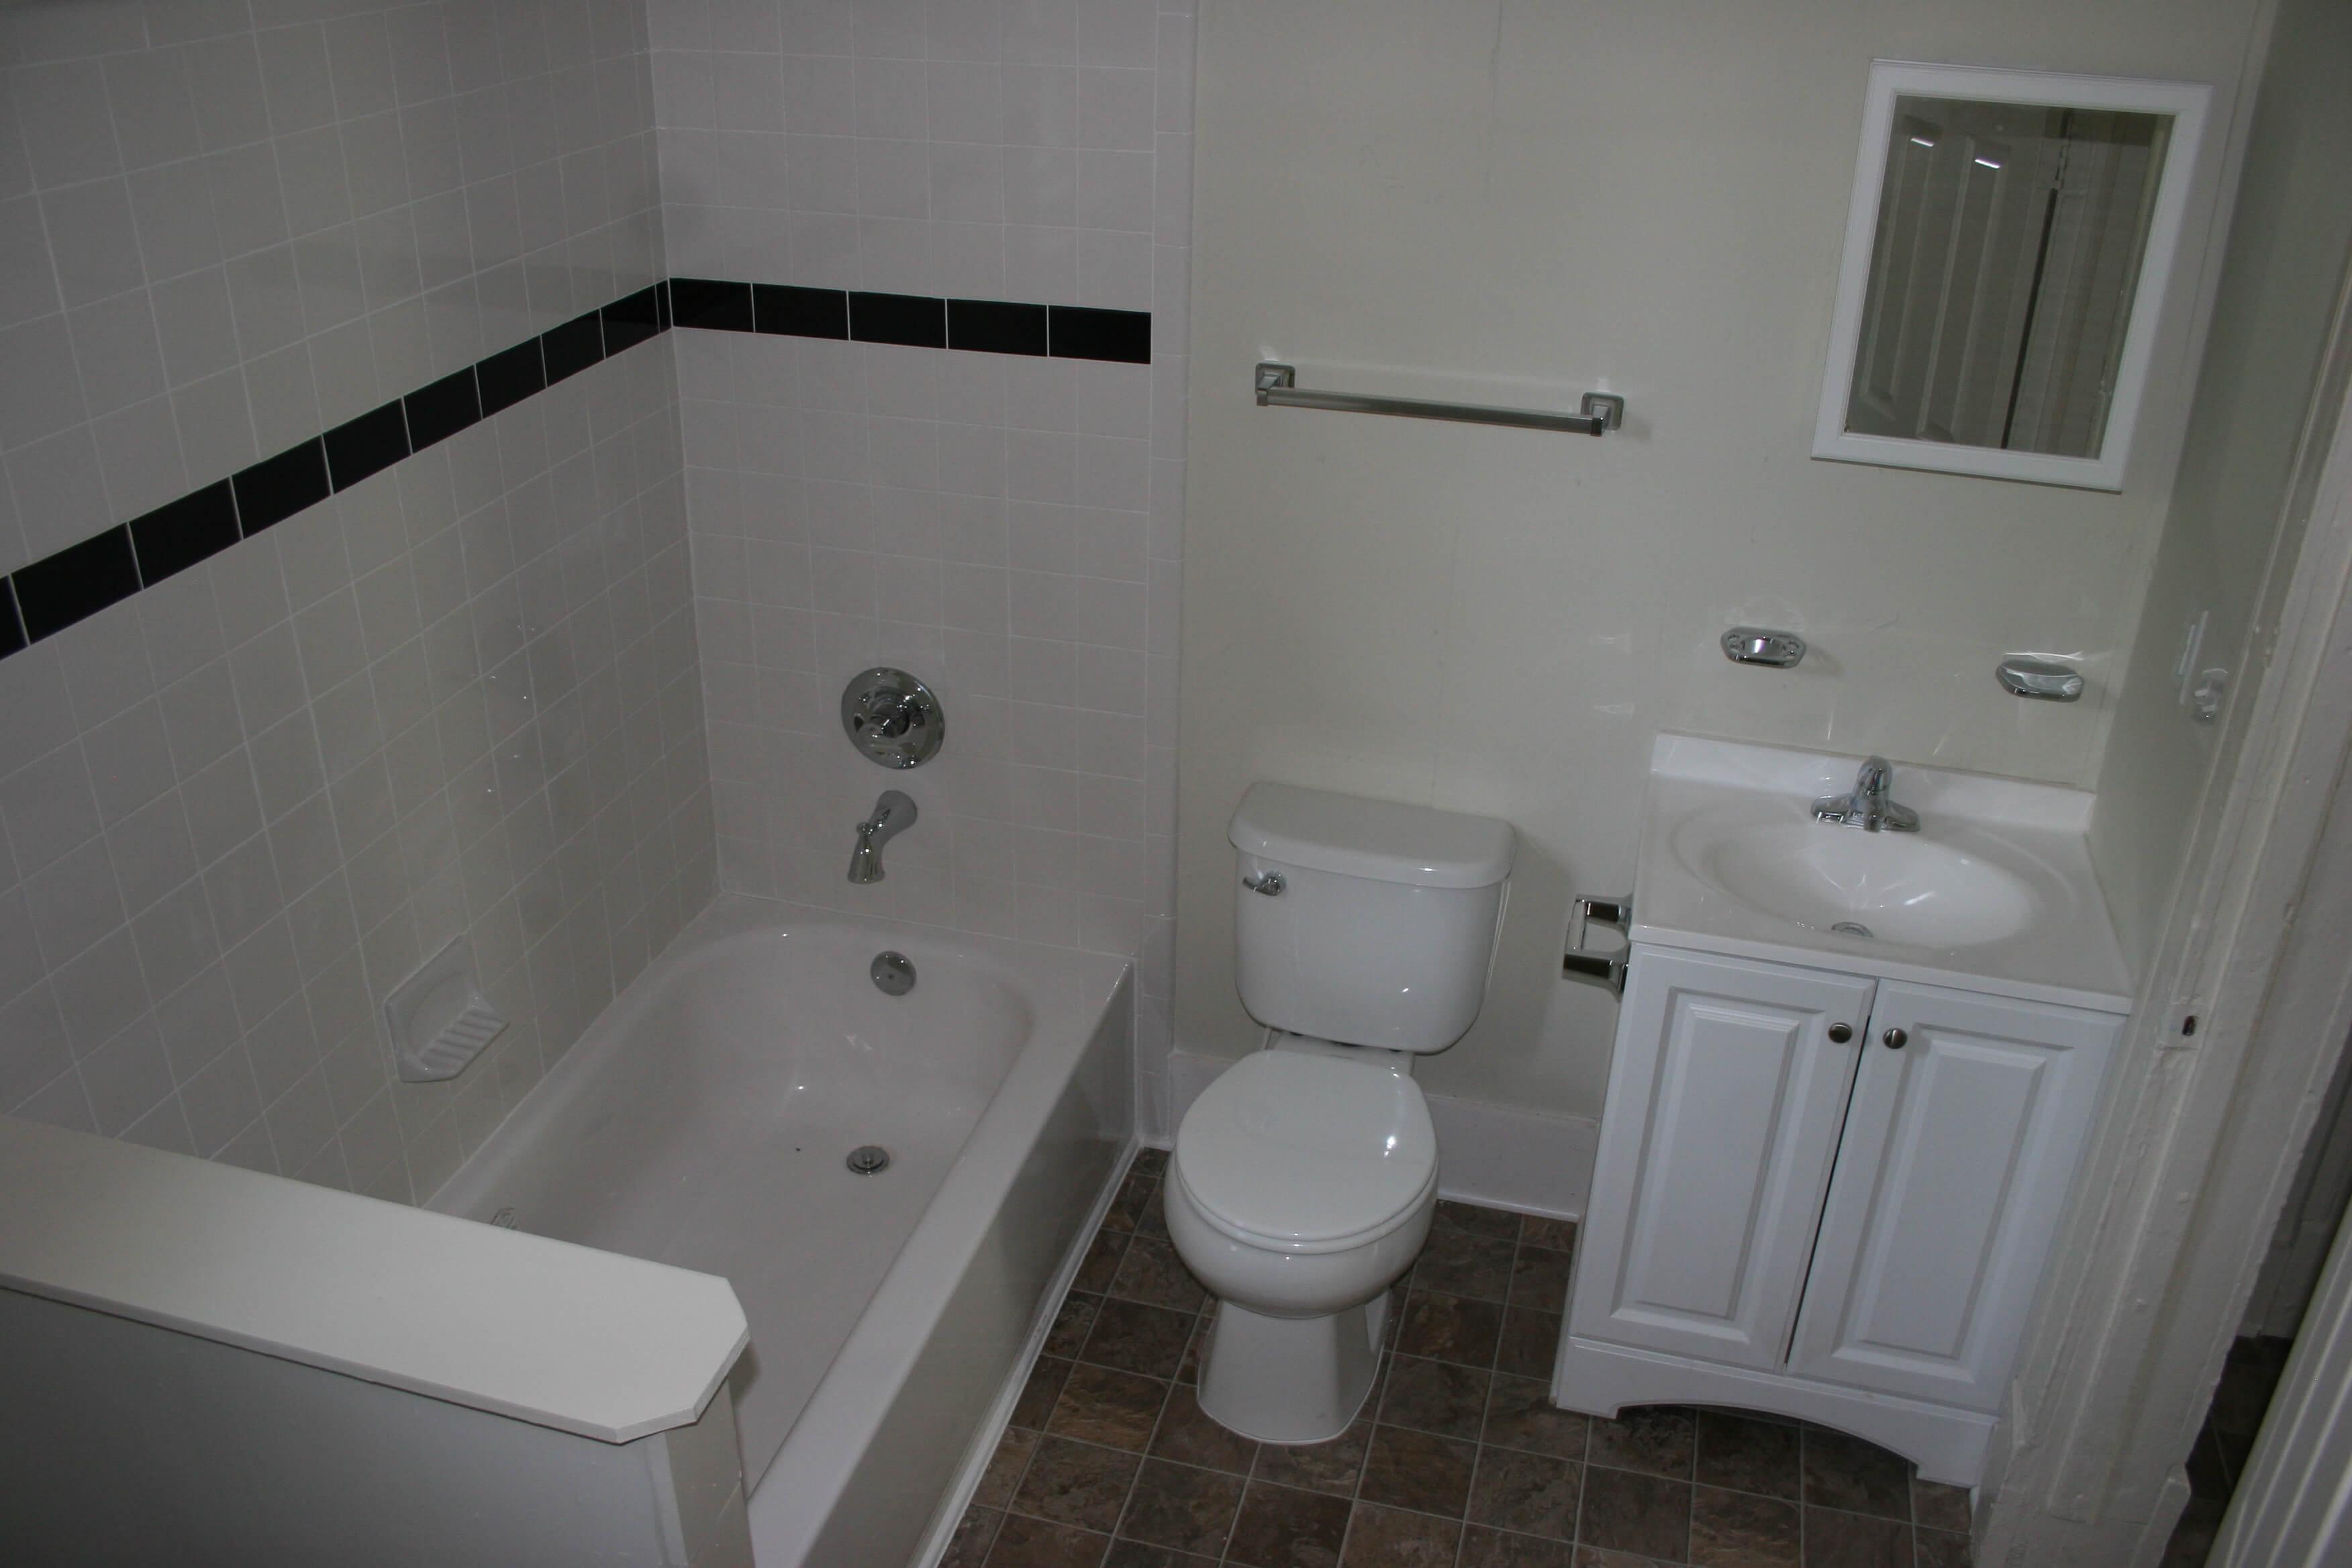 Bathroom Remodeling Durham Nc bathroom remodeling durham